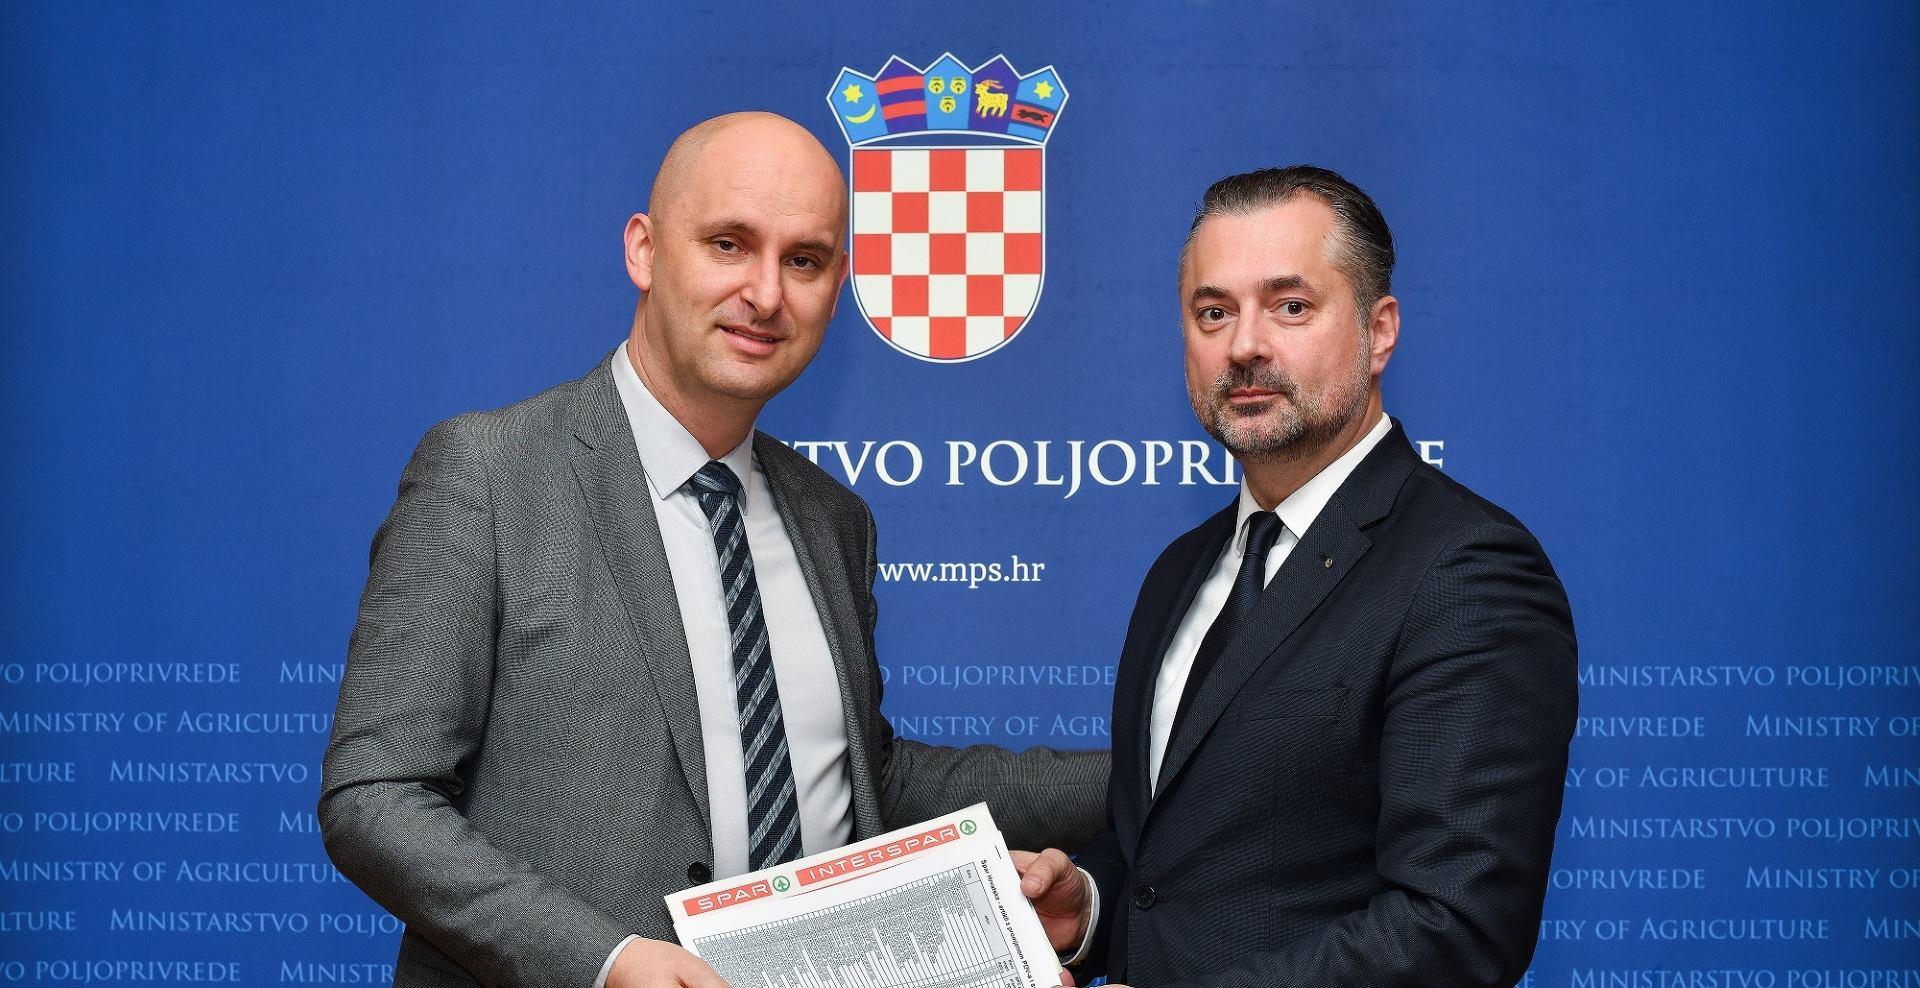 Tomislavu Tolušiću predan popis SPAR proizvoda